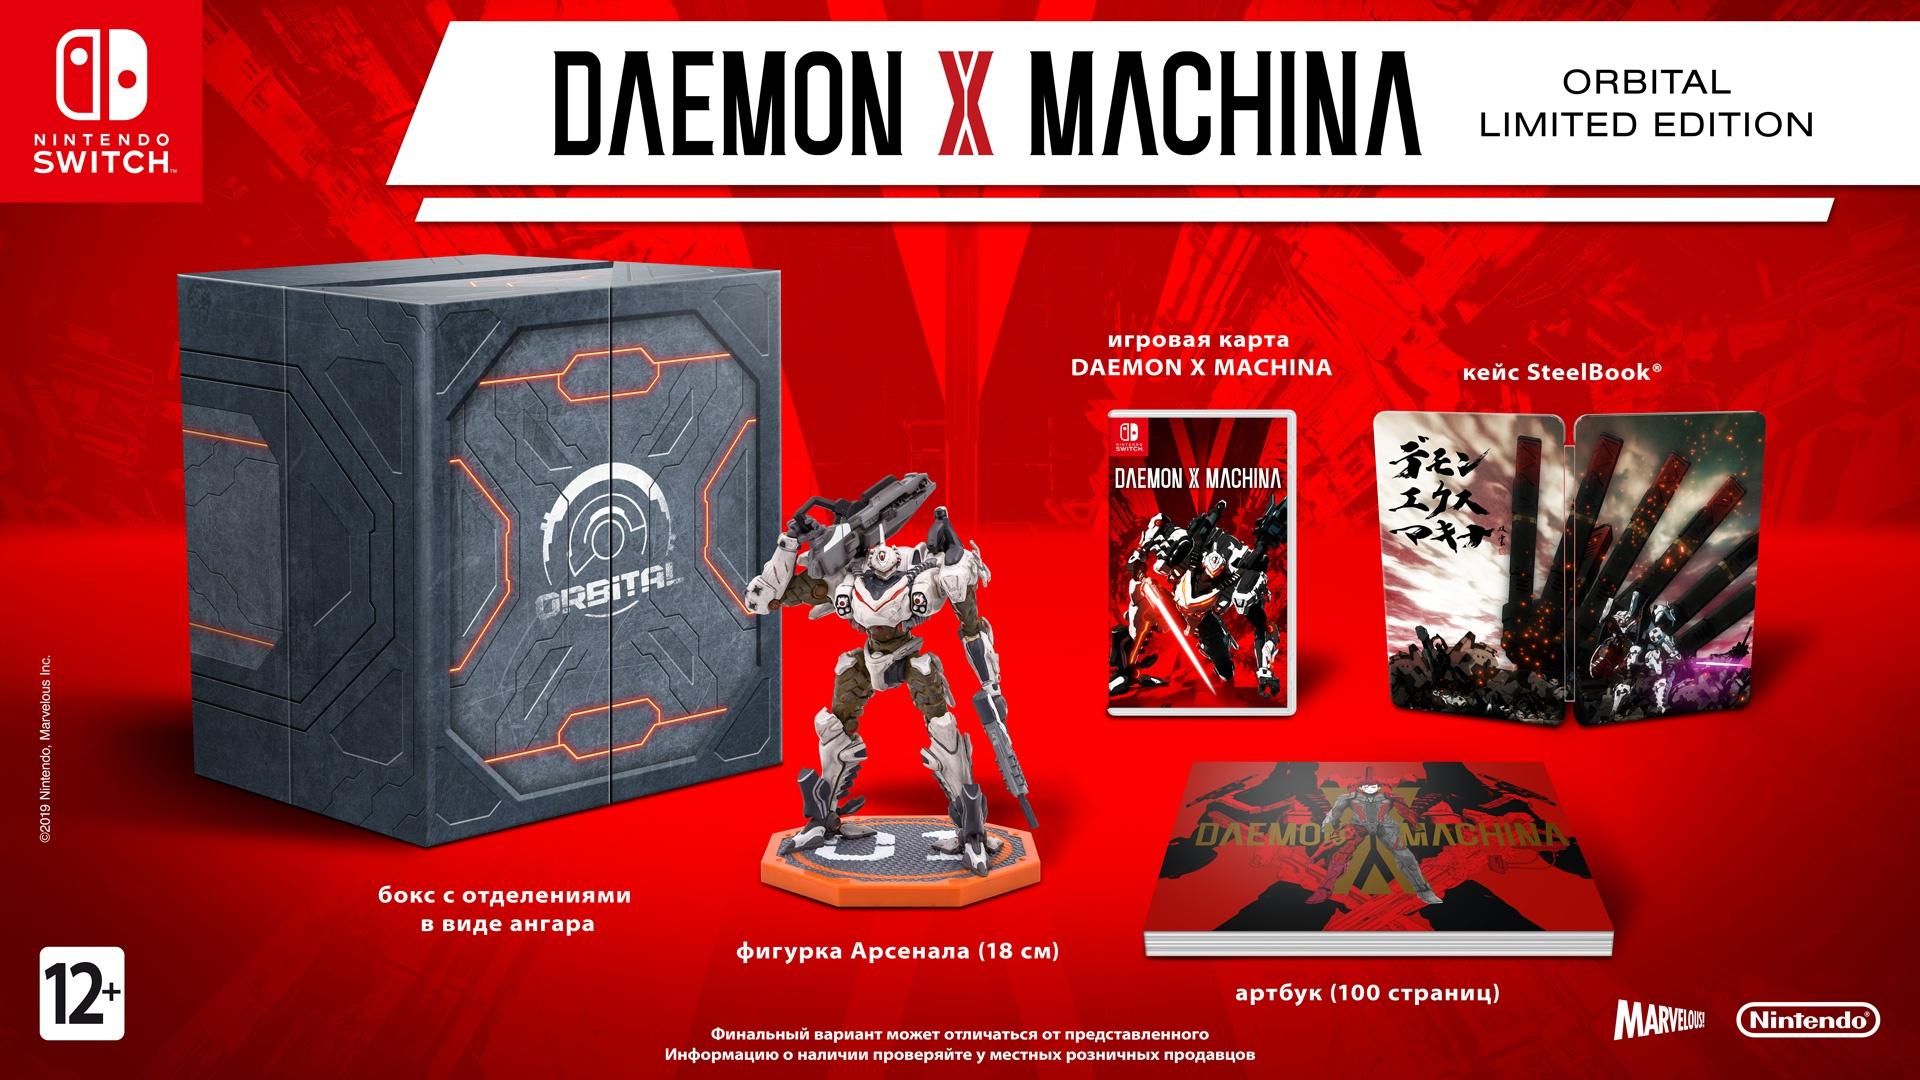 Daemon x Machina. Orbital Limited Edition. [Unboxing]. - Изображение 1